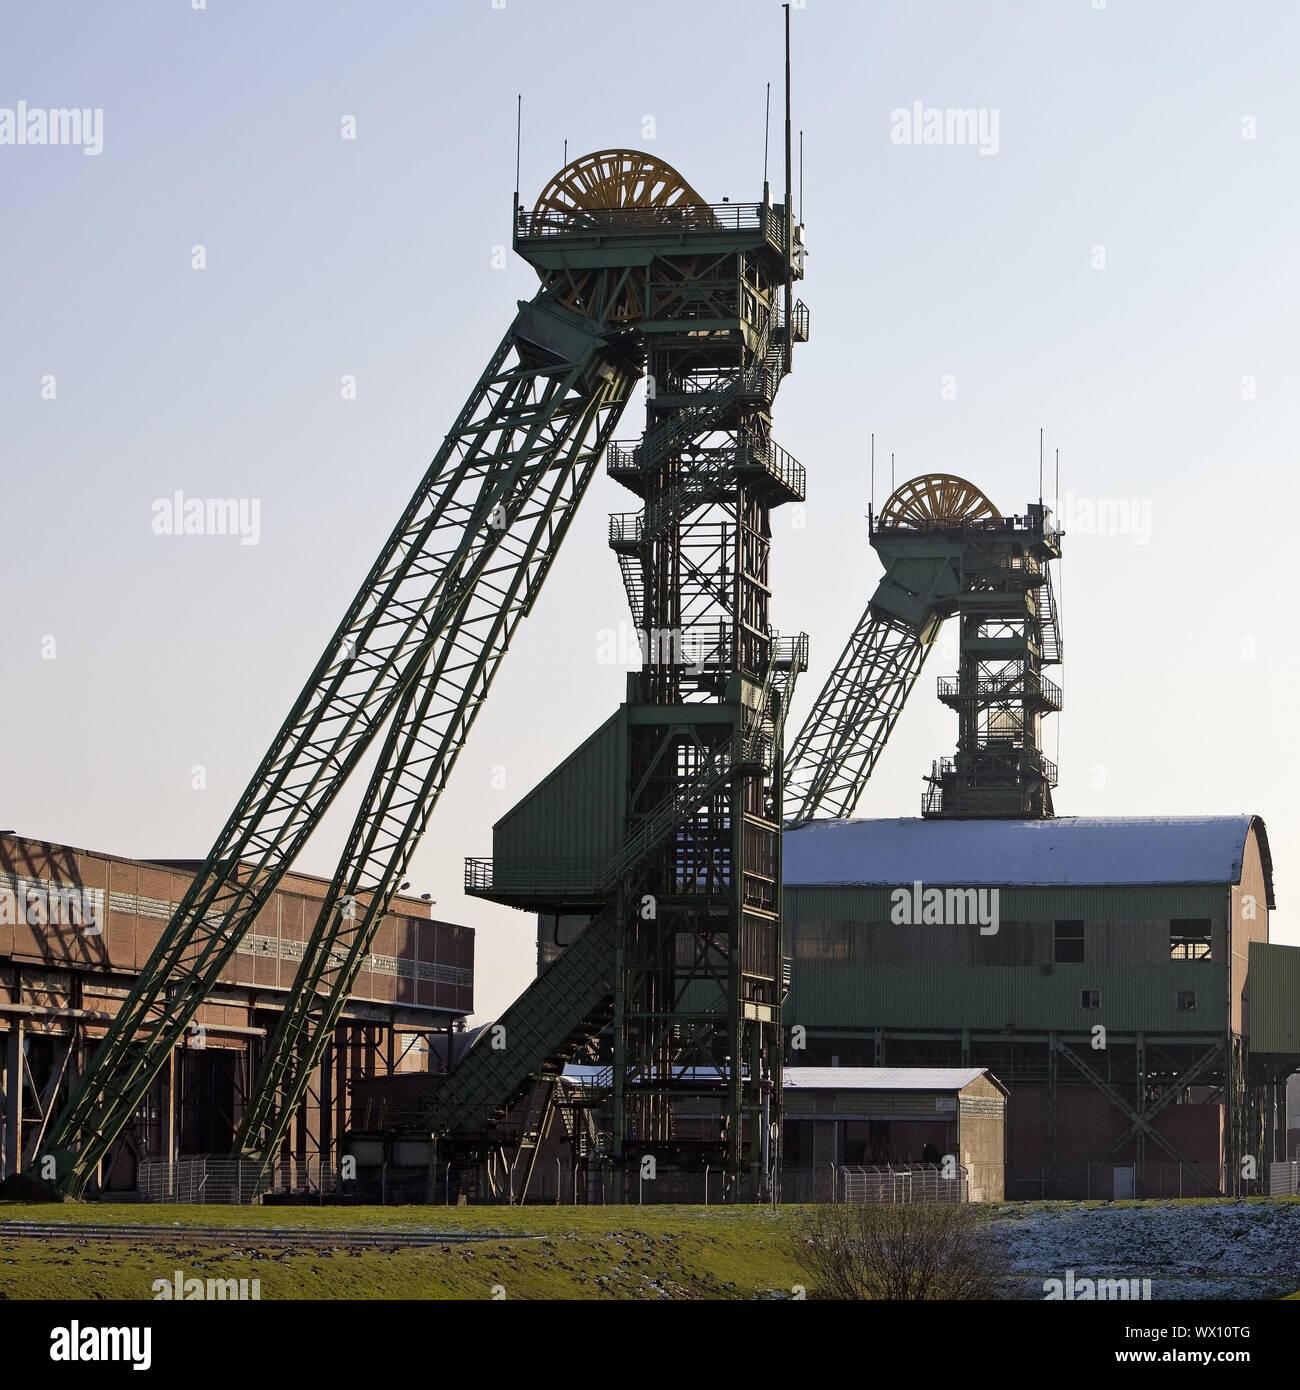 shaft tower of the disused coal mine Westfalen, Ahlen, North Rhine-Westphalia, Germany, Europe Stock Photo